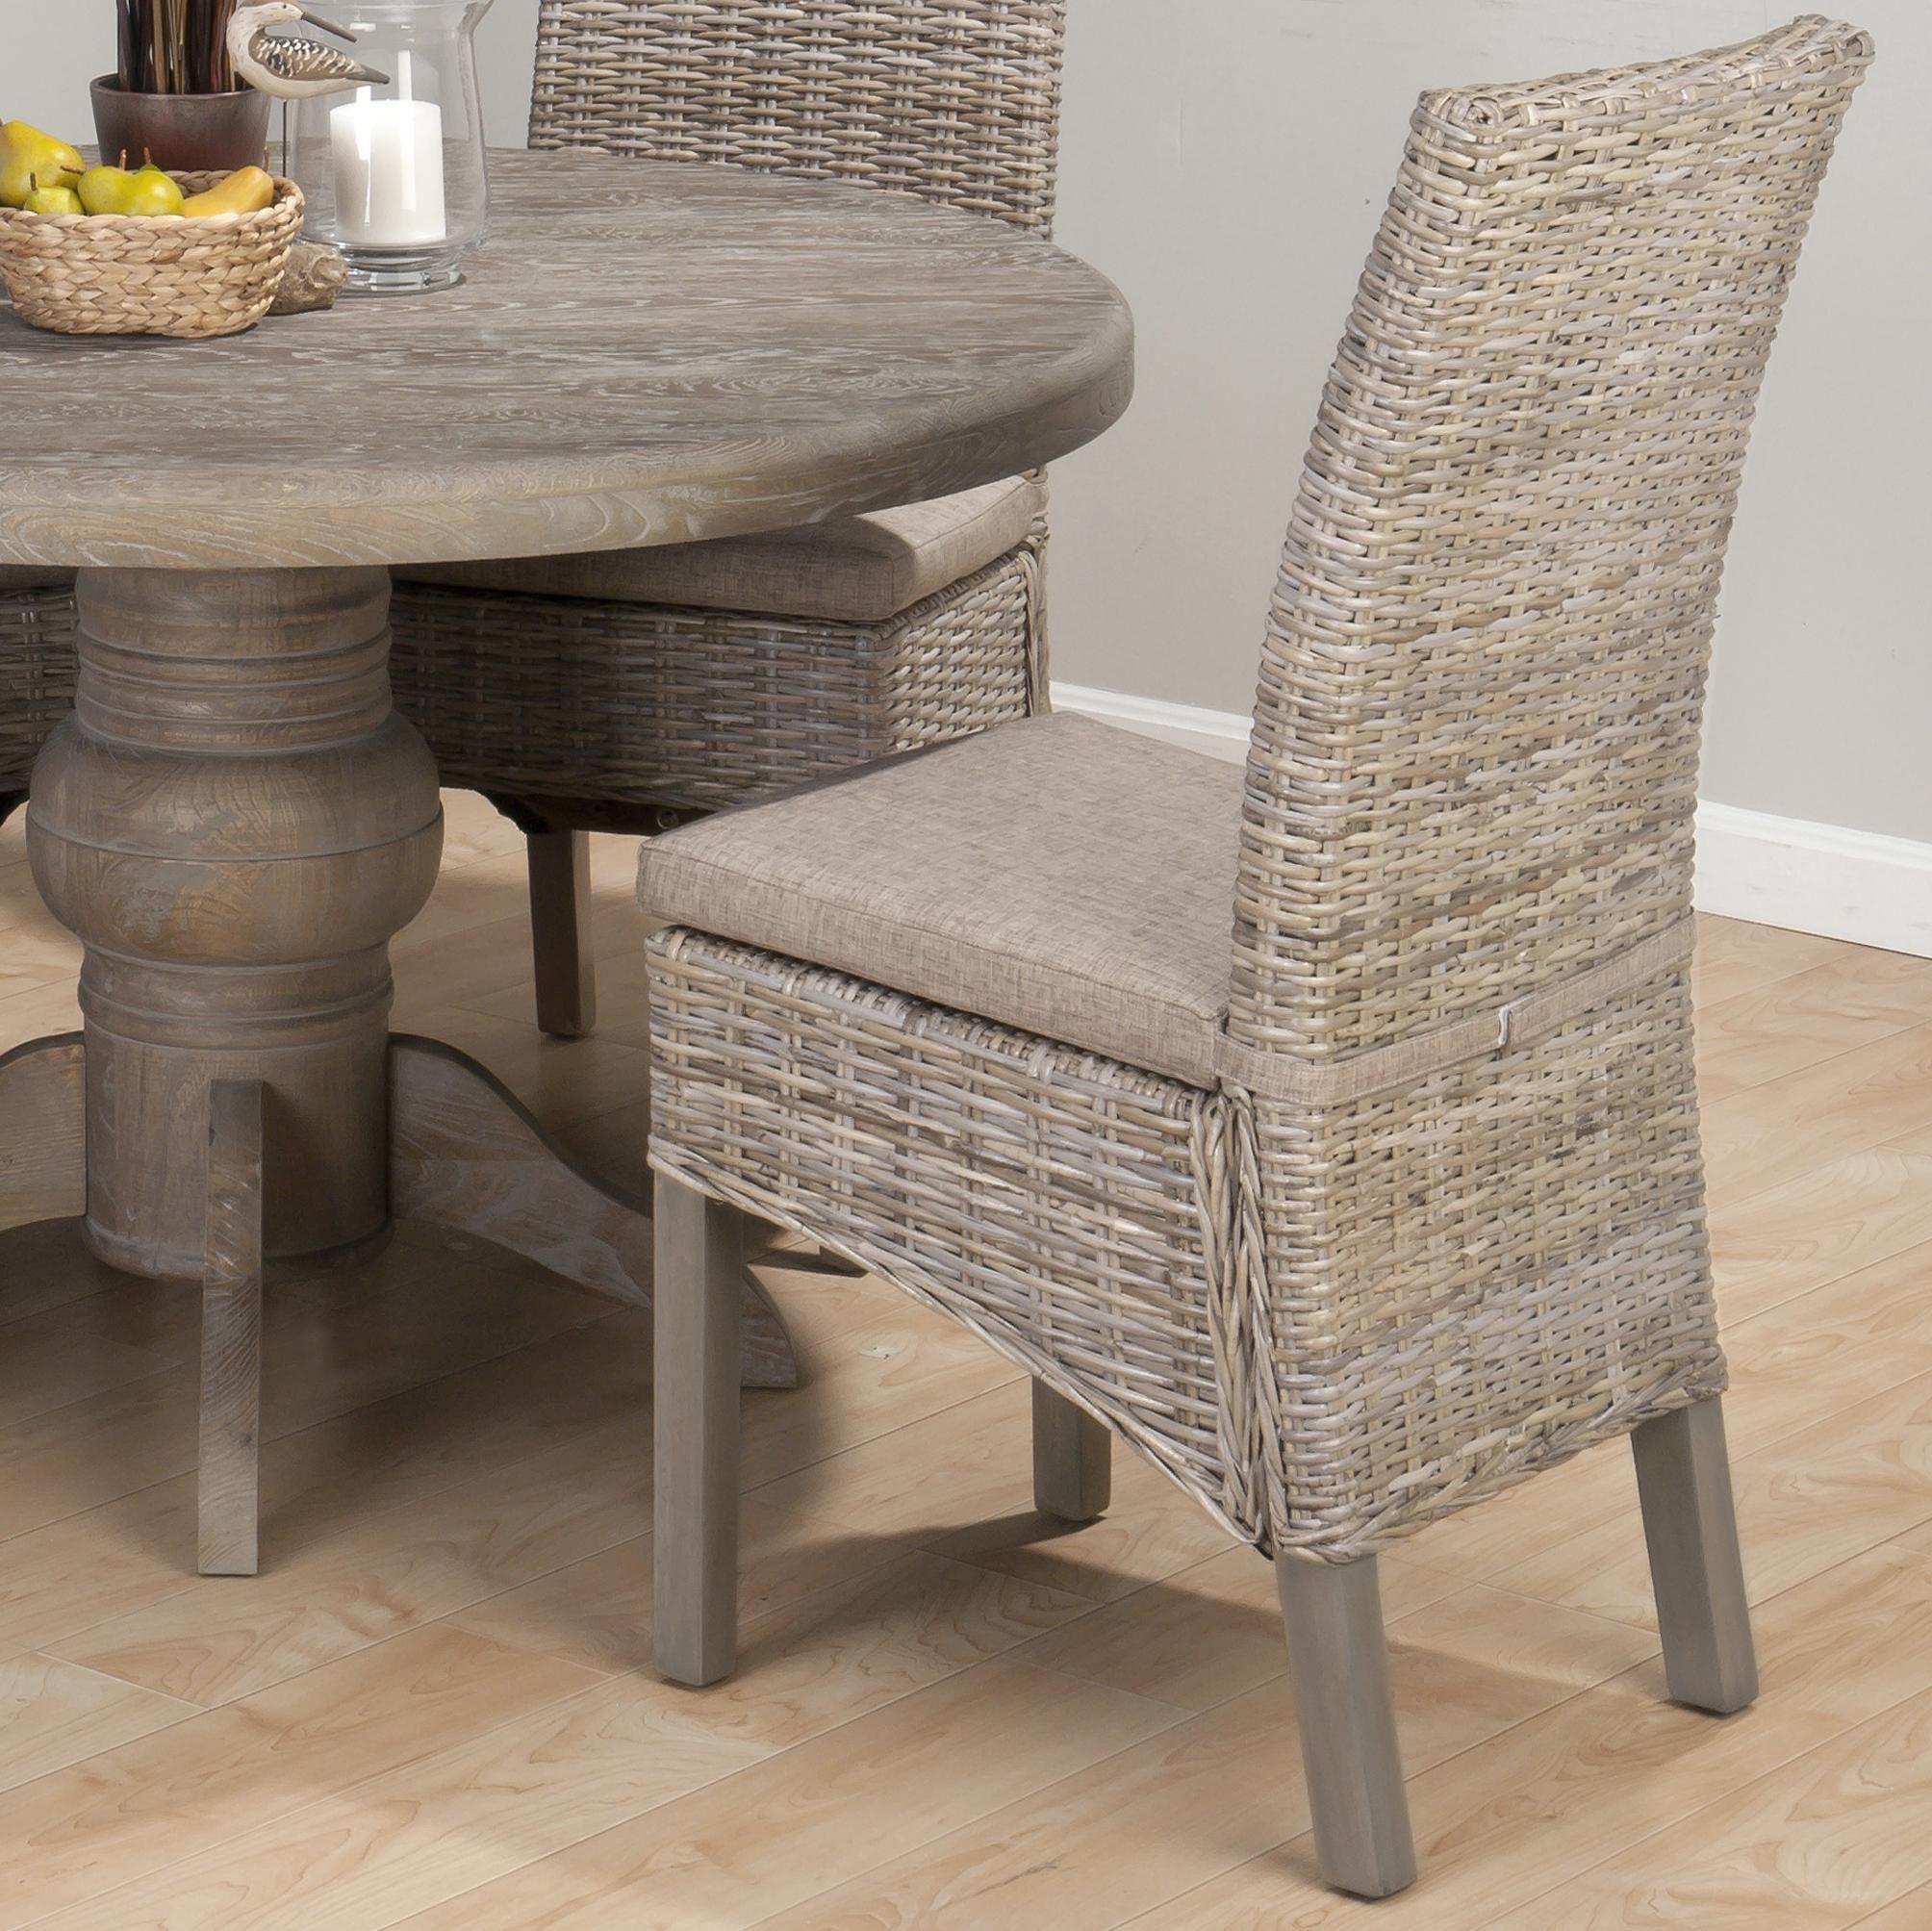 Maryland Company 856 Coastal Kubu Rattan Dining Side Chair With Oatmeal  Linen Seat By Jofran